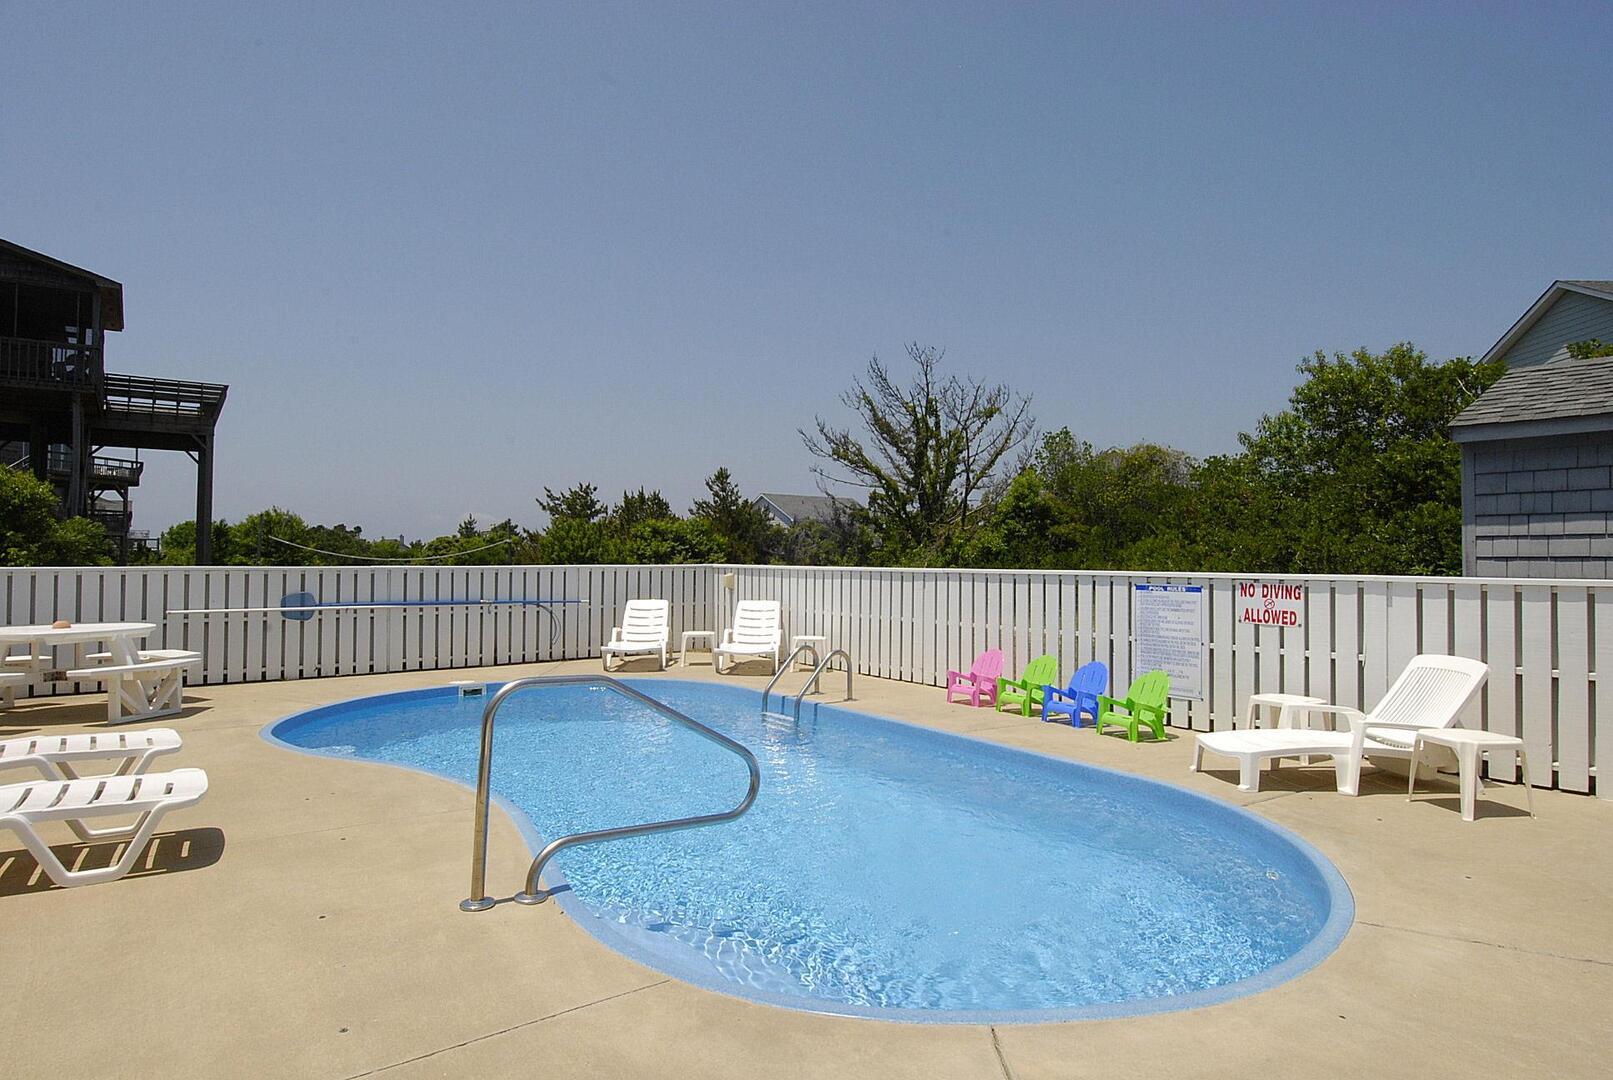 Lower Level,Pool Deck,